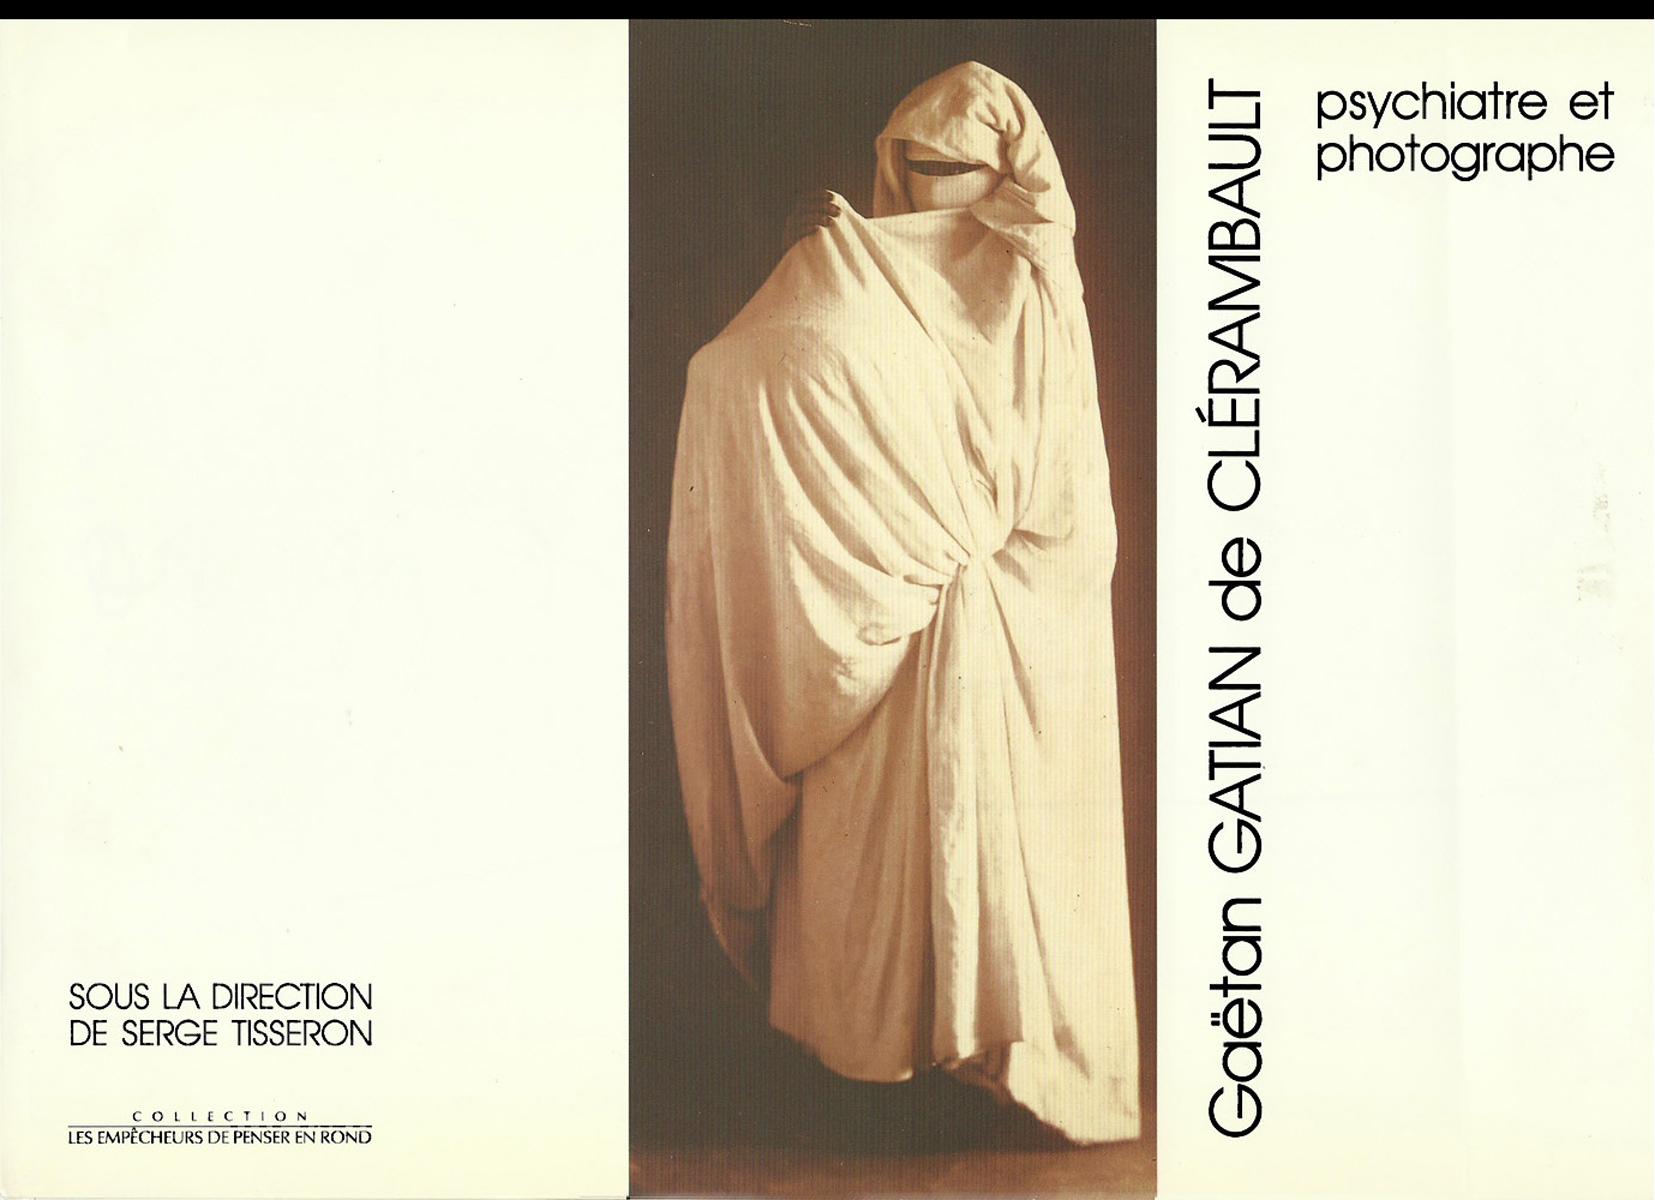 Clérambault, psychiatre et photographe